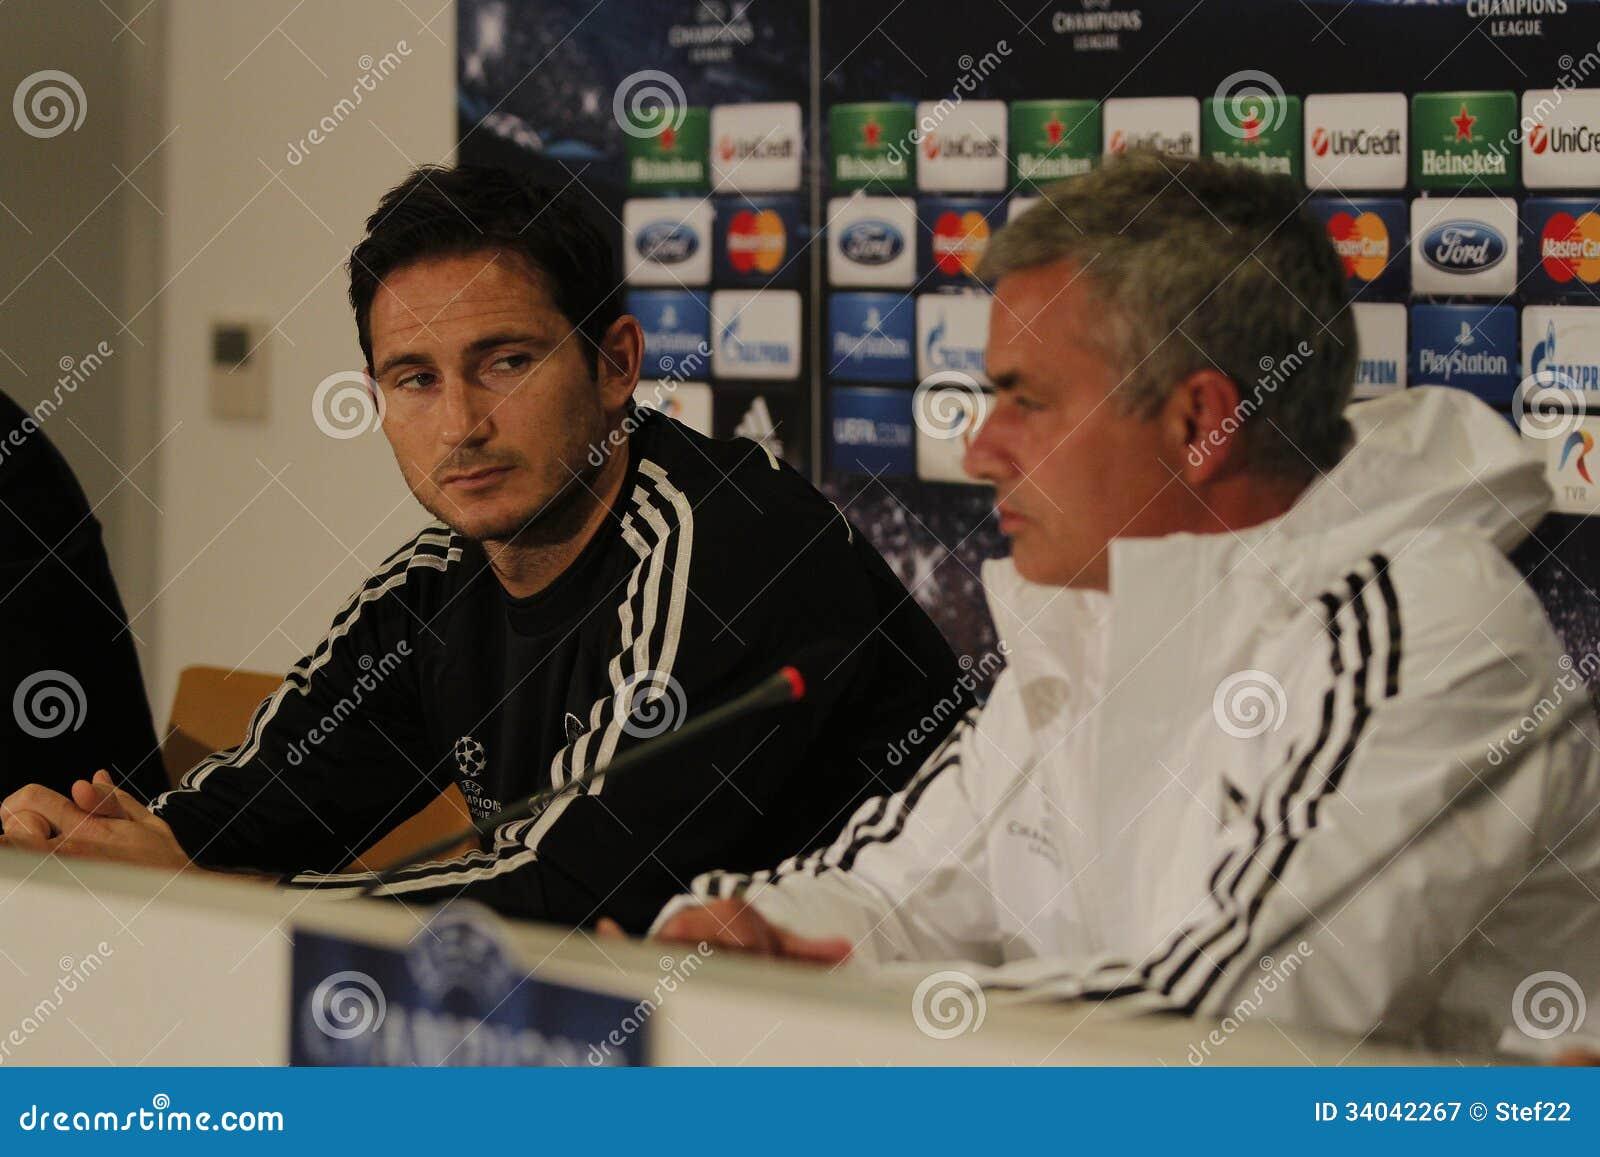 Jose Mourinho y Frank Lampard